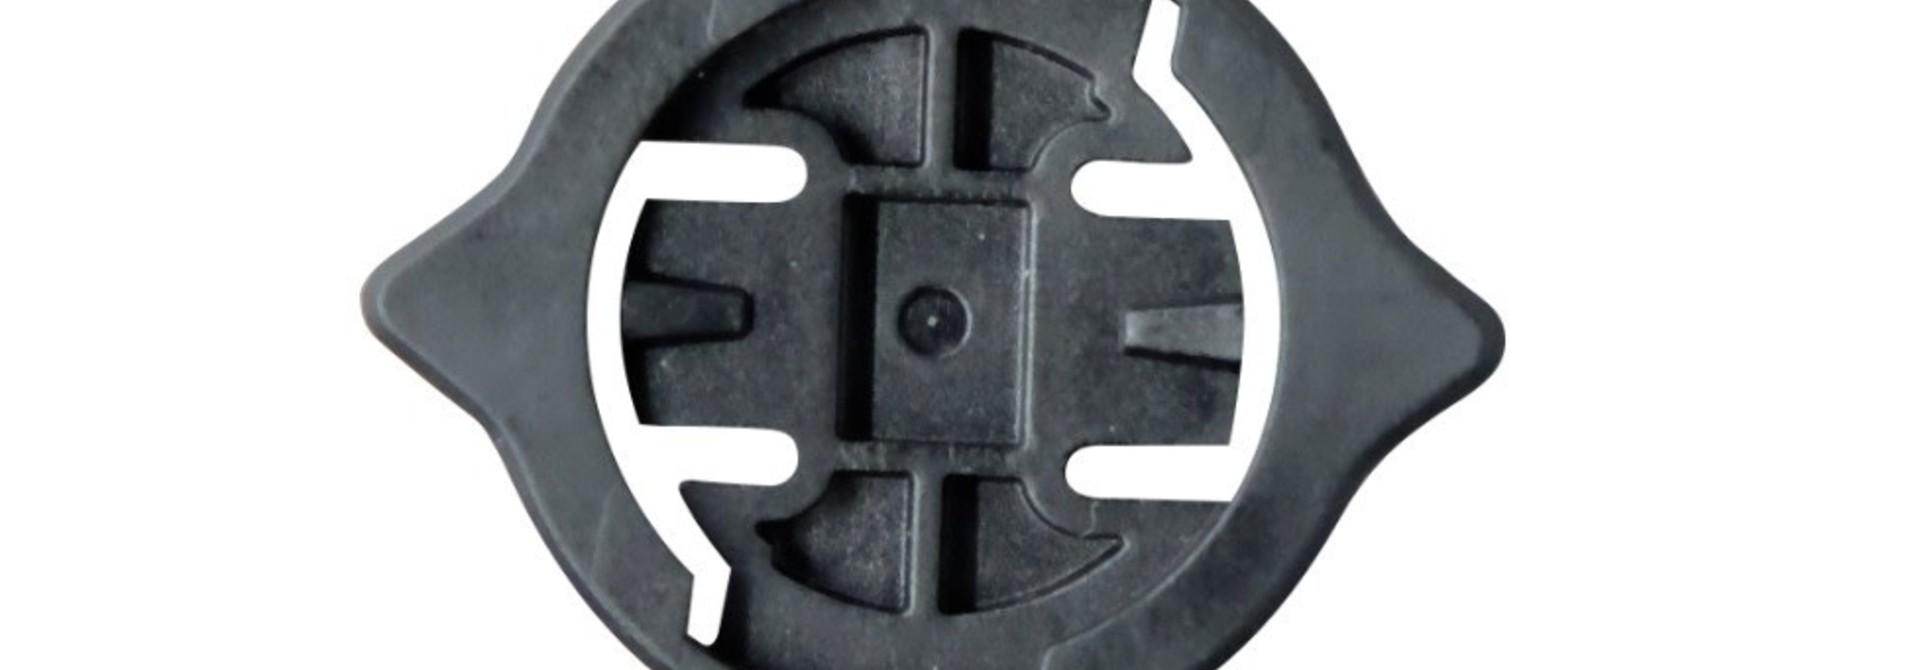 Quarter-Turn Adapter Puck For Garmin Mounts